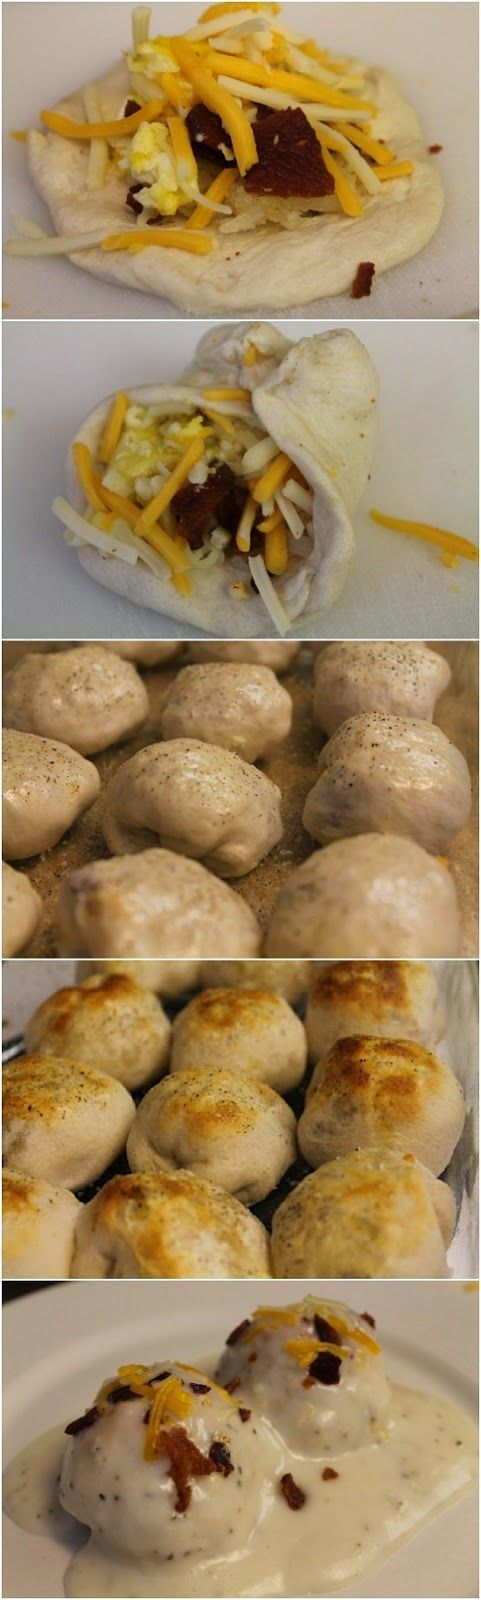 Stuffed Breakfast Bubble Biscuits Recipe